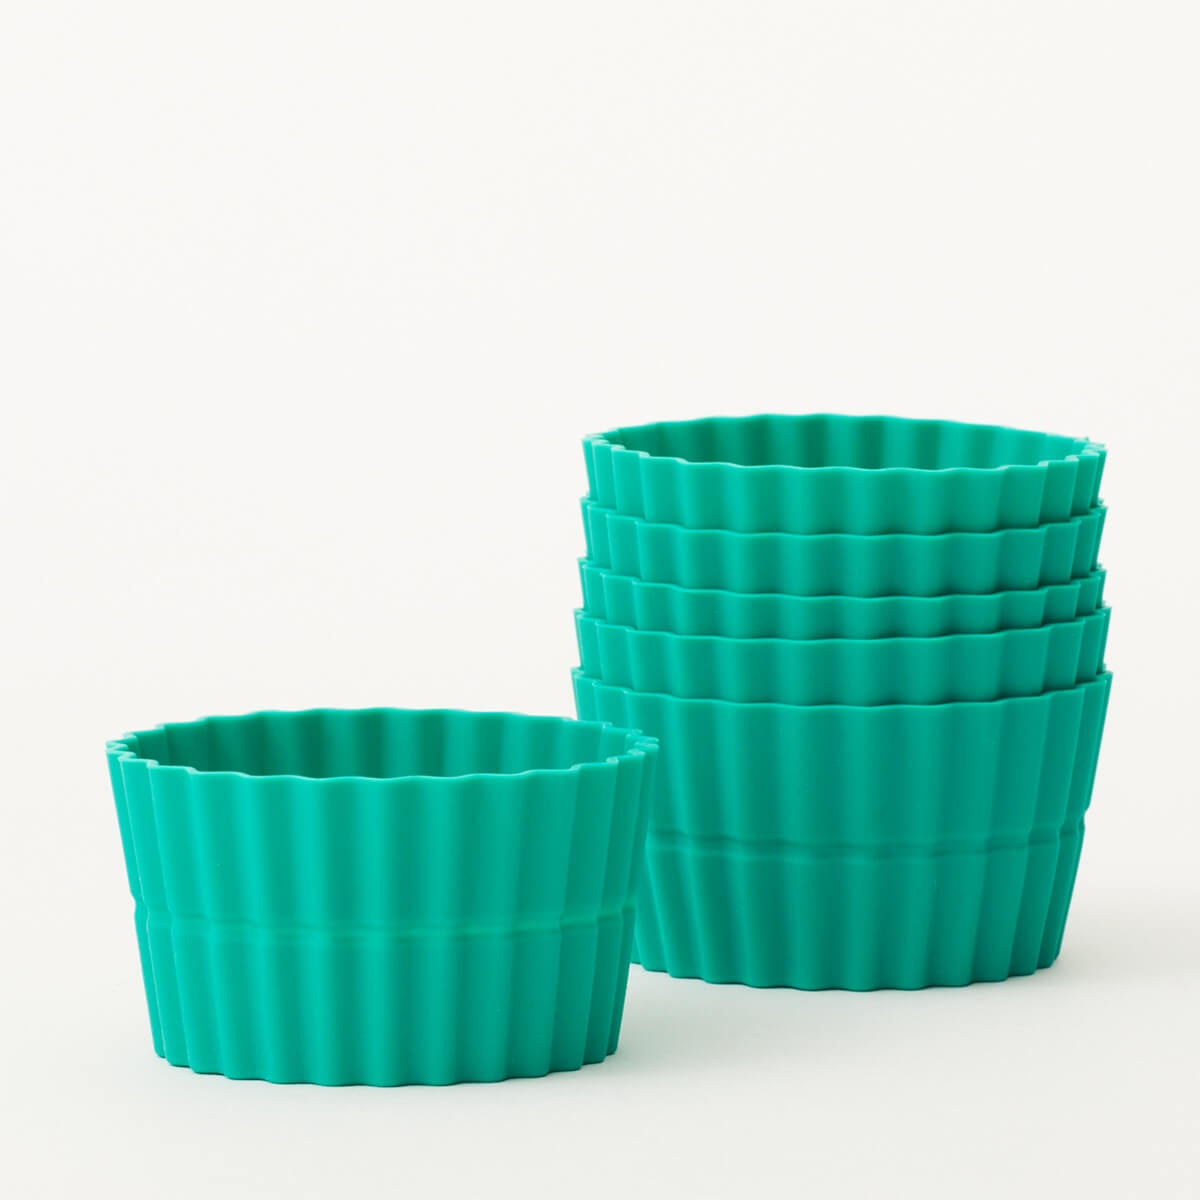 2-in-1 Muffin and Mini Cake Cups